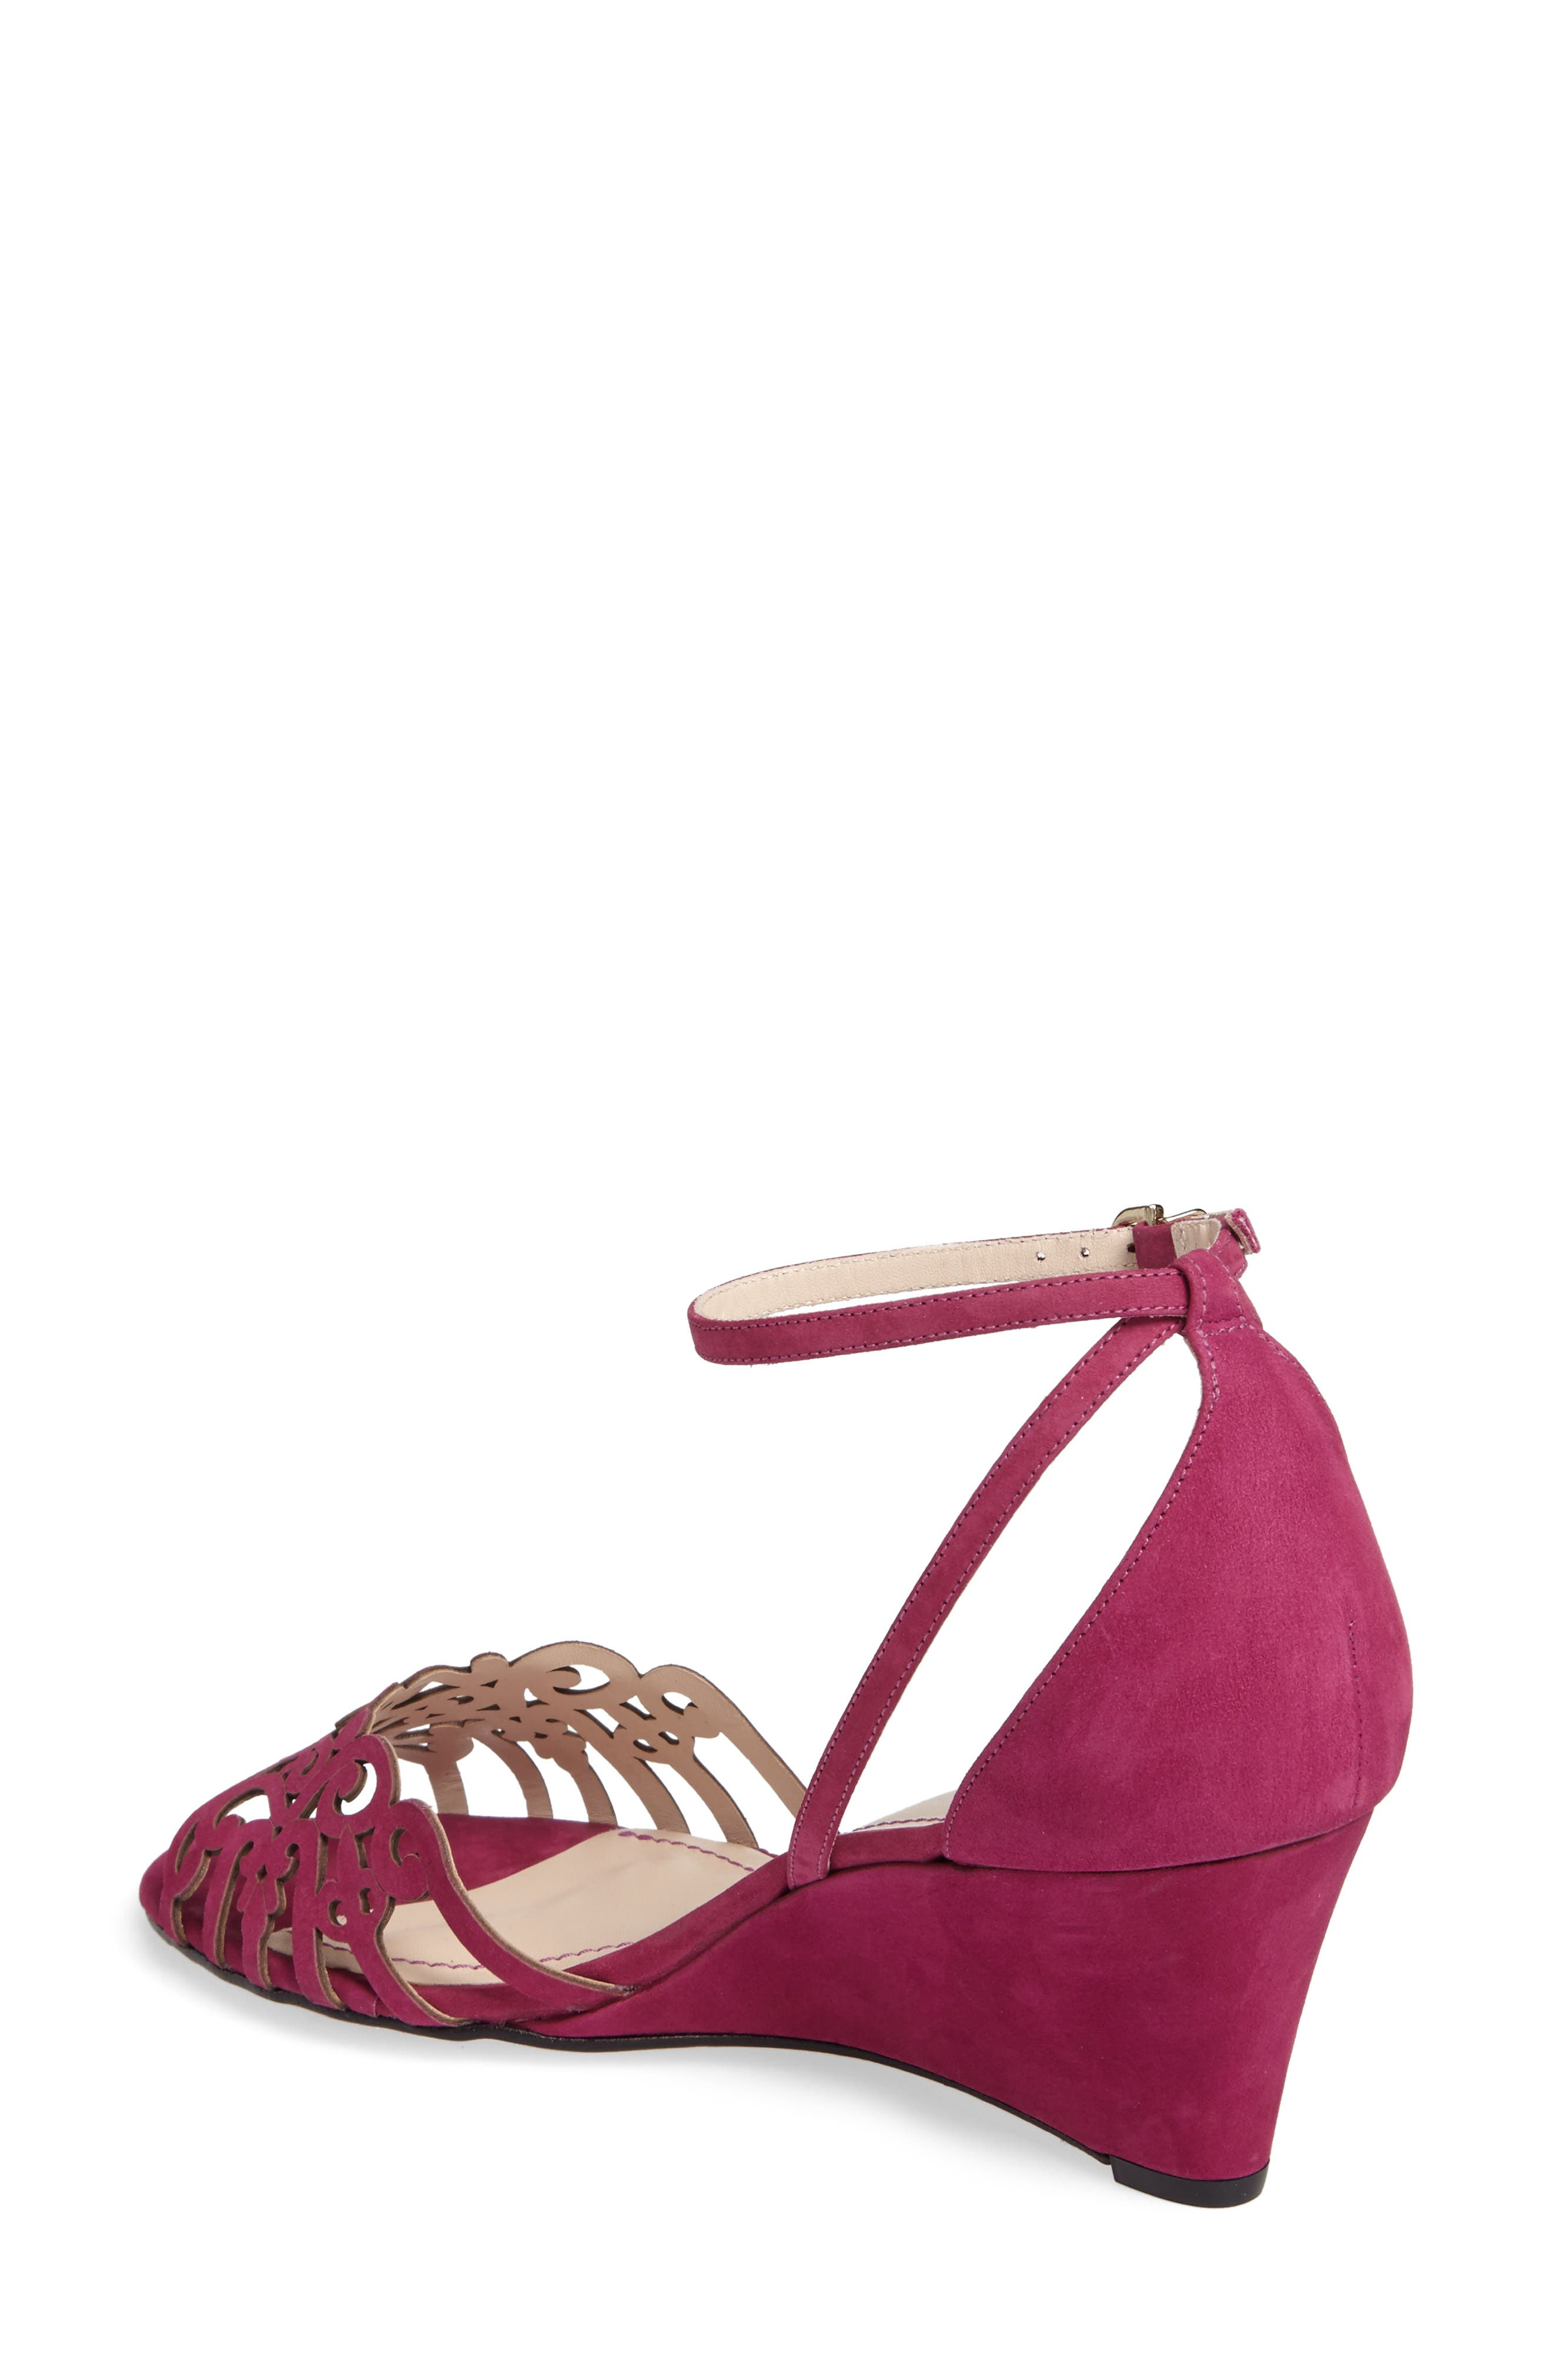 Alternate Image 2  - Klub Nico 'Kingston' Ankle Strap Wedge Sandal (Women)